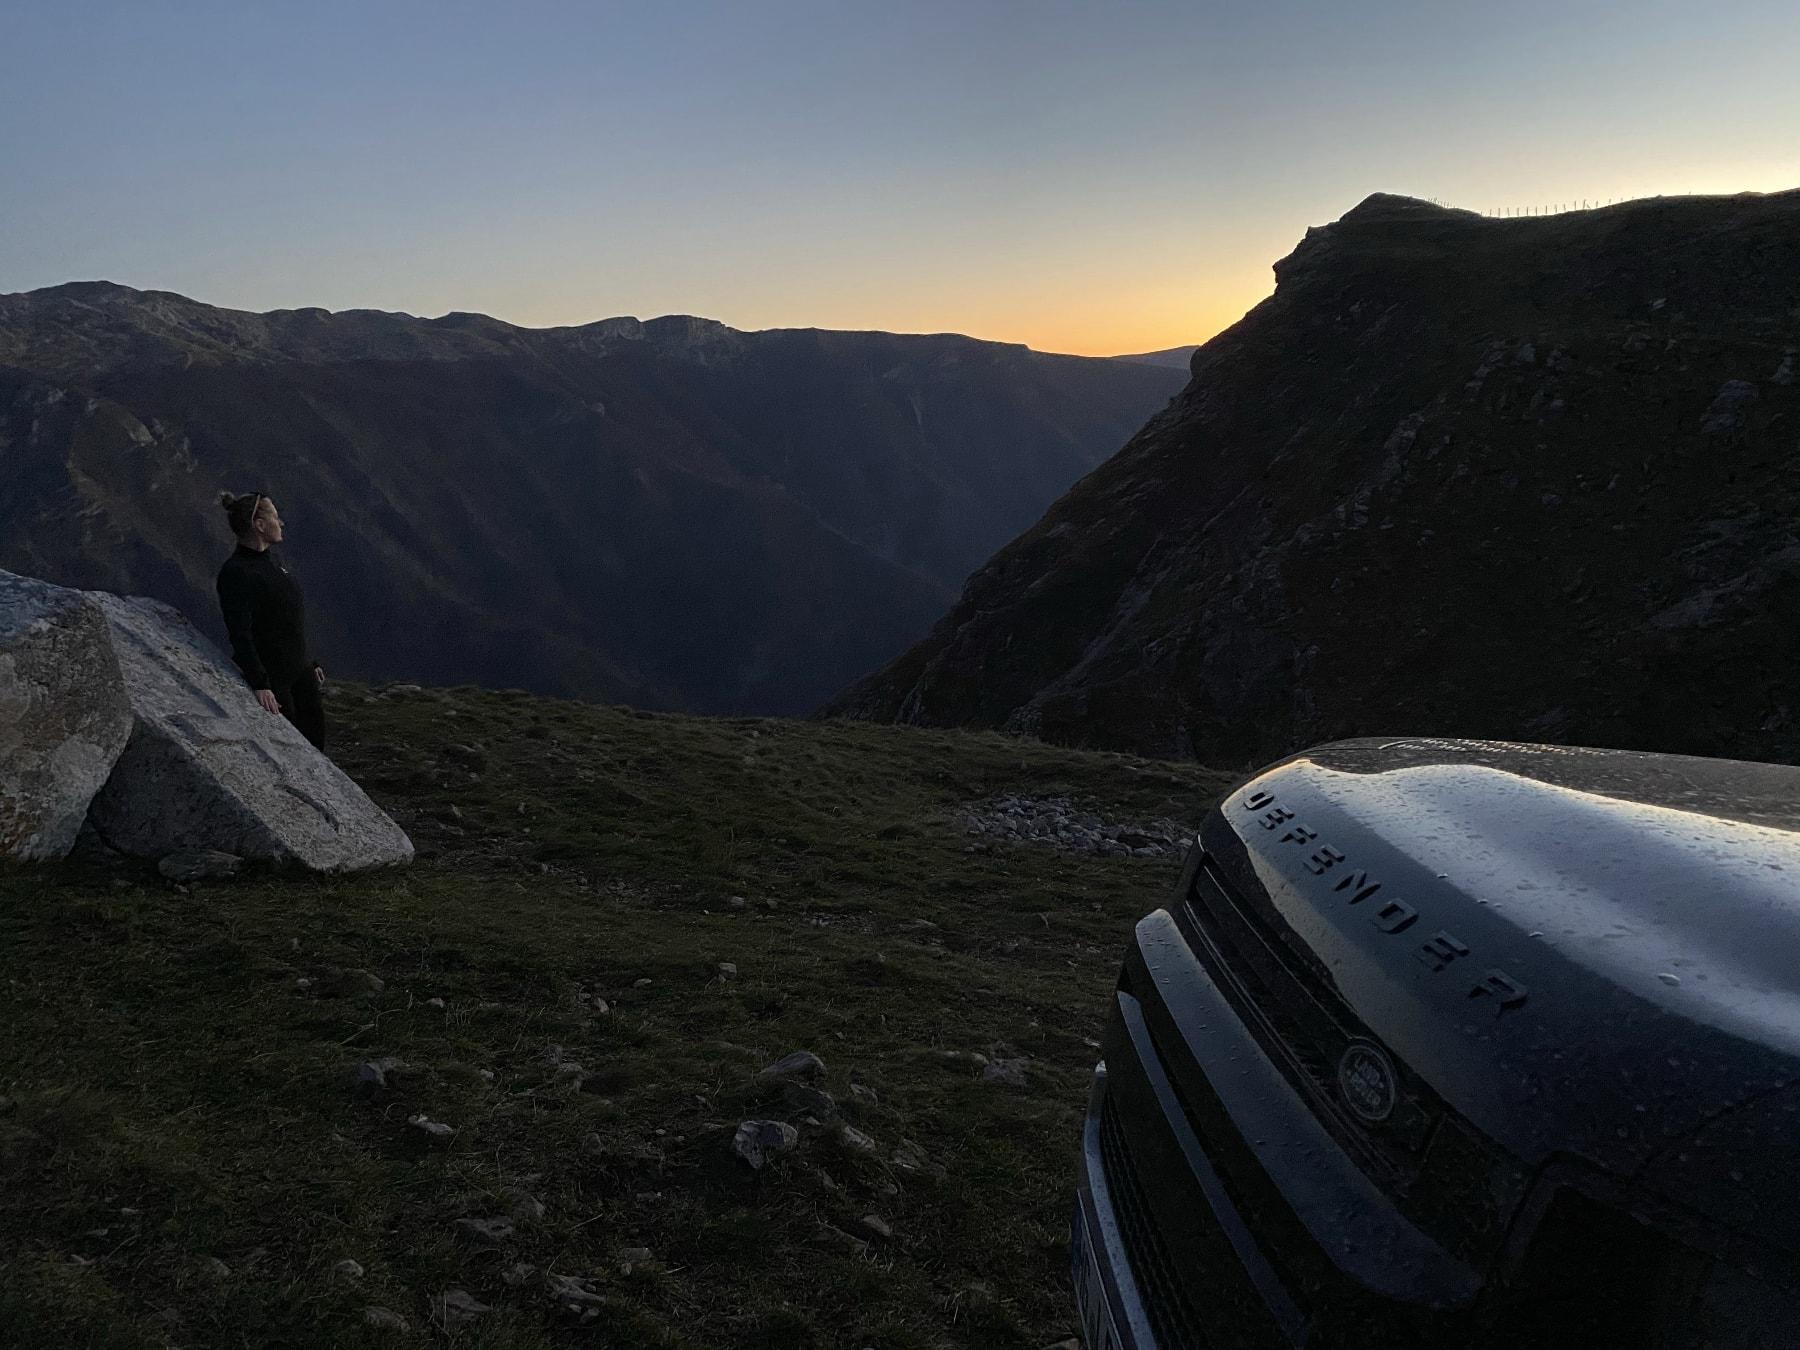 So close to heaven - In The Mountain Village Lukomir 13